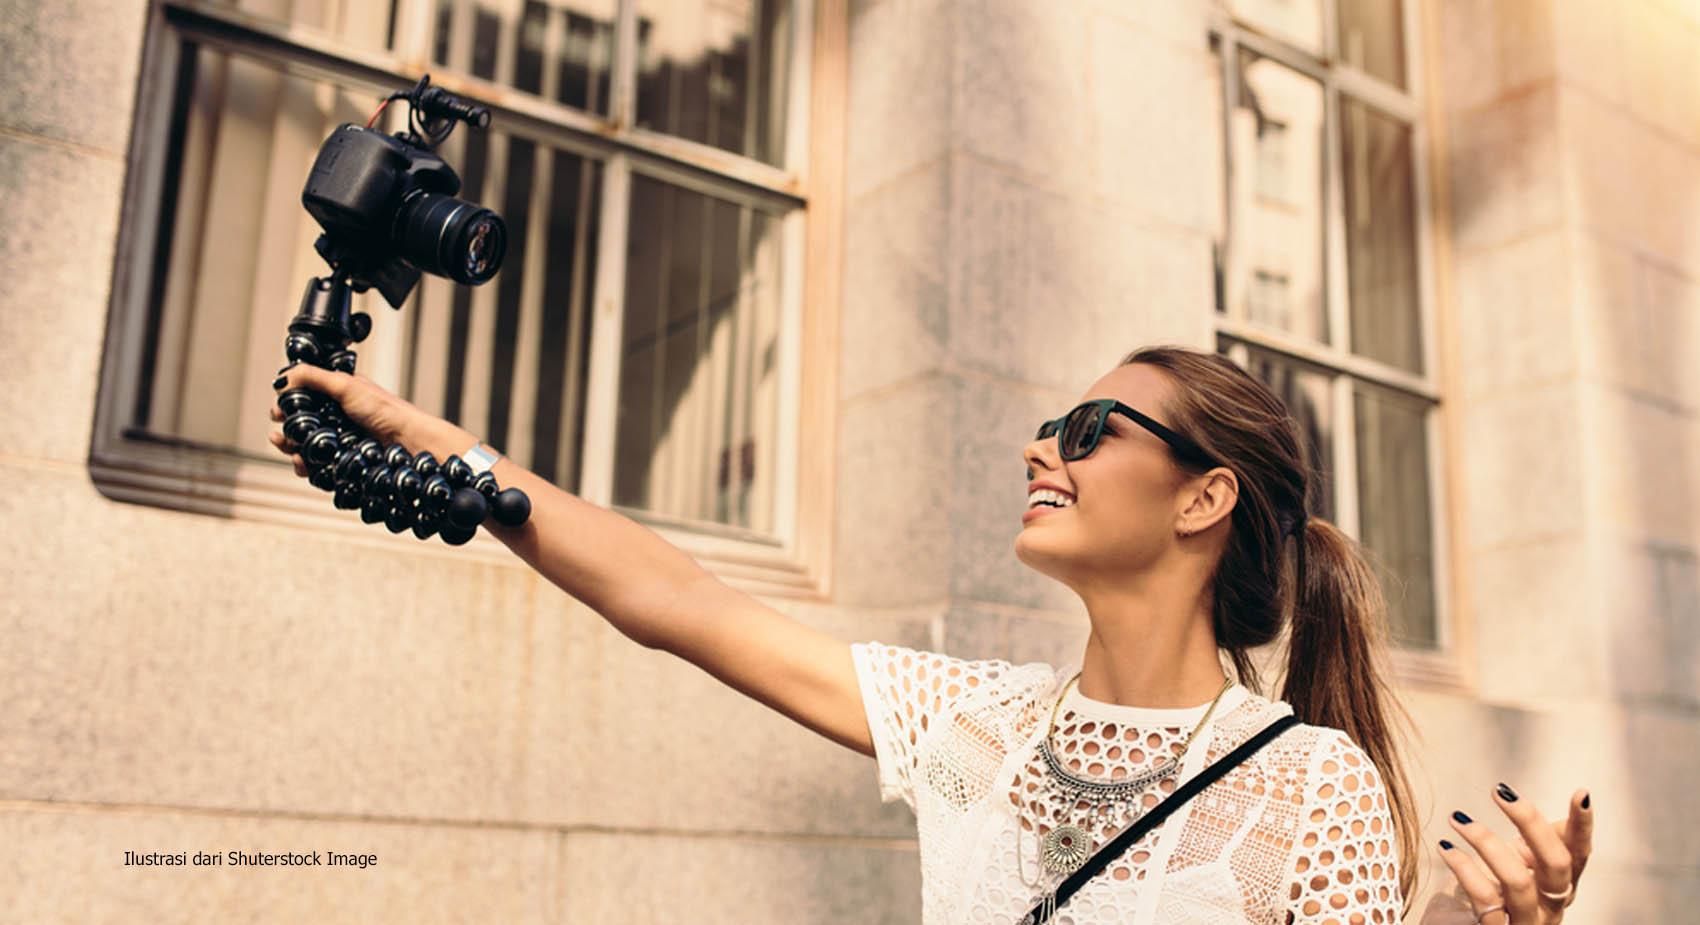 jangan malu jadi vlogger